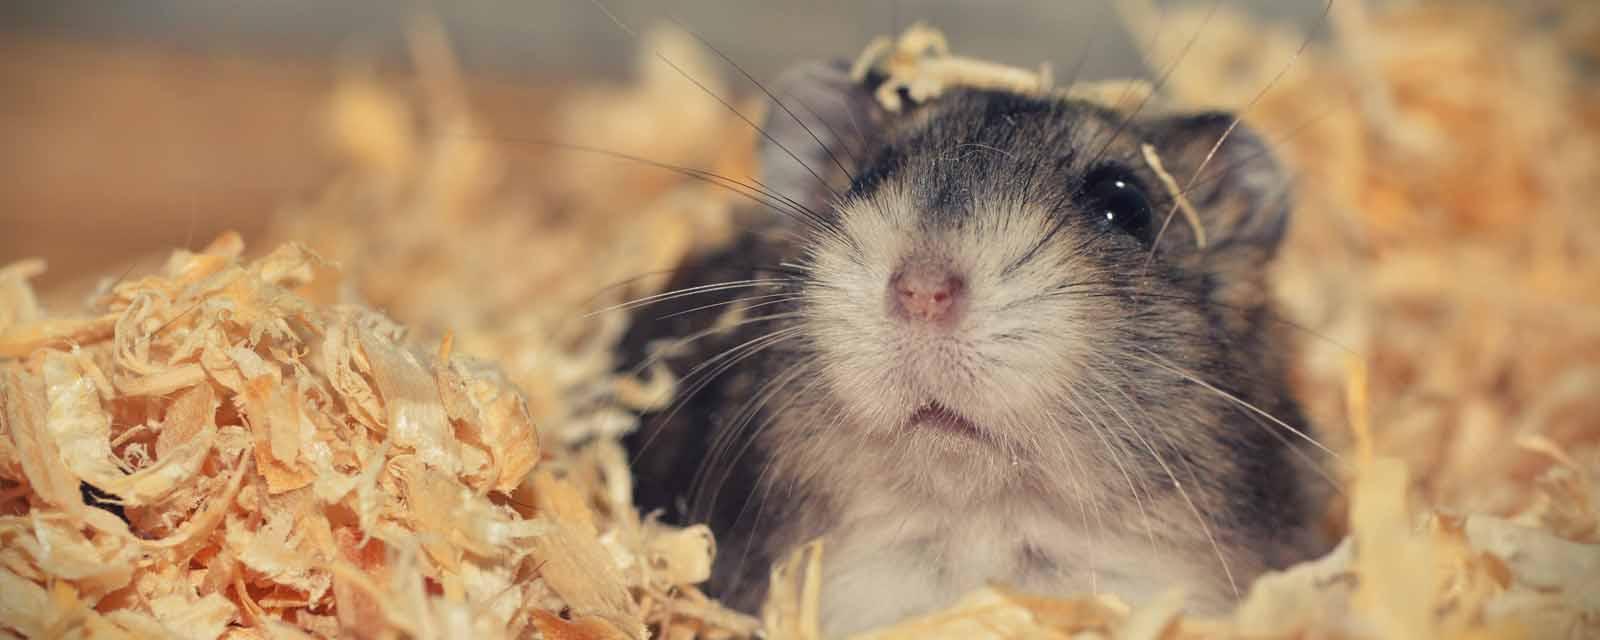 Hamsterfutter kaufen